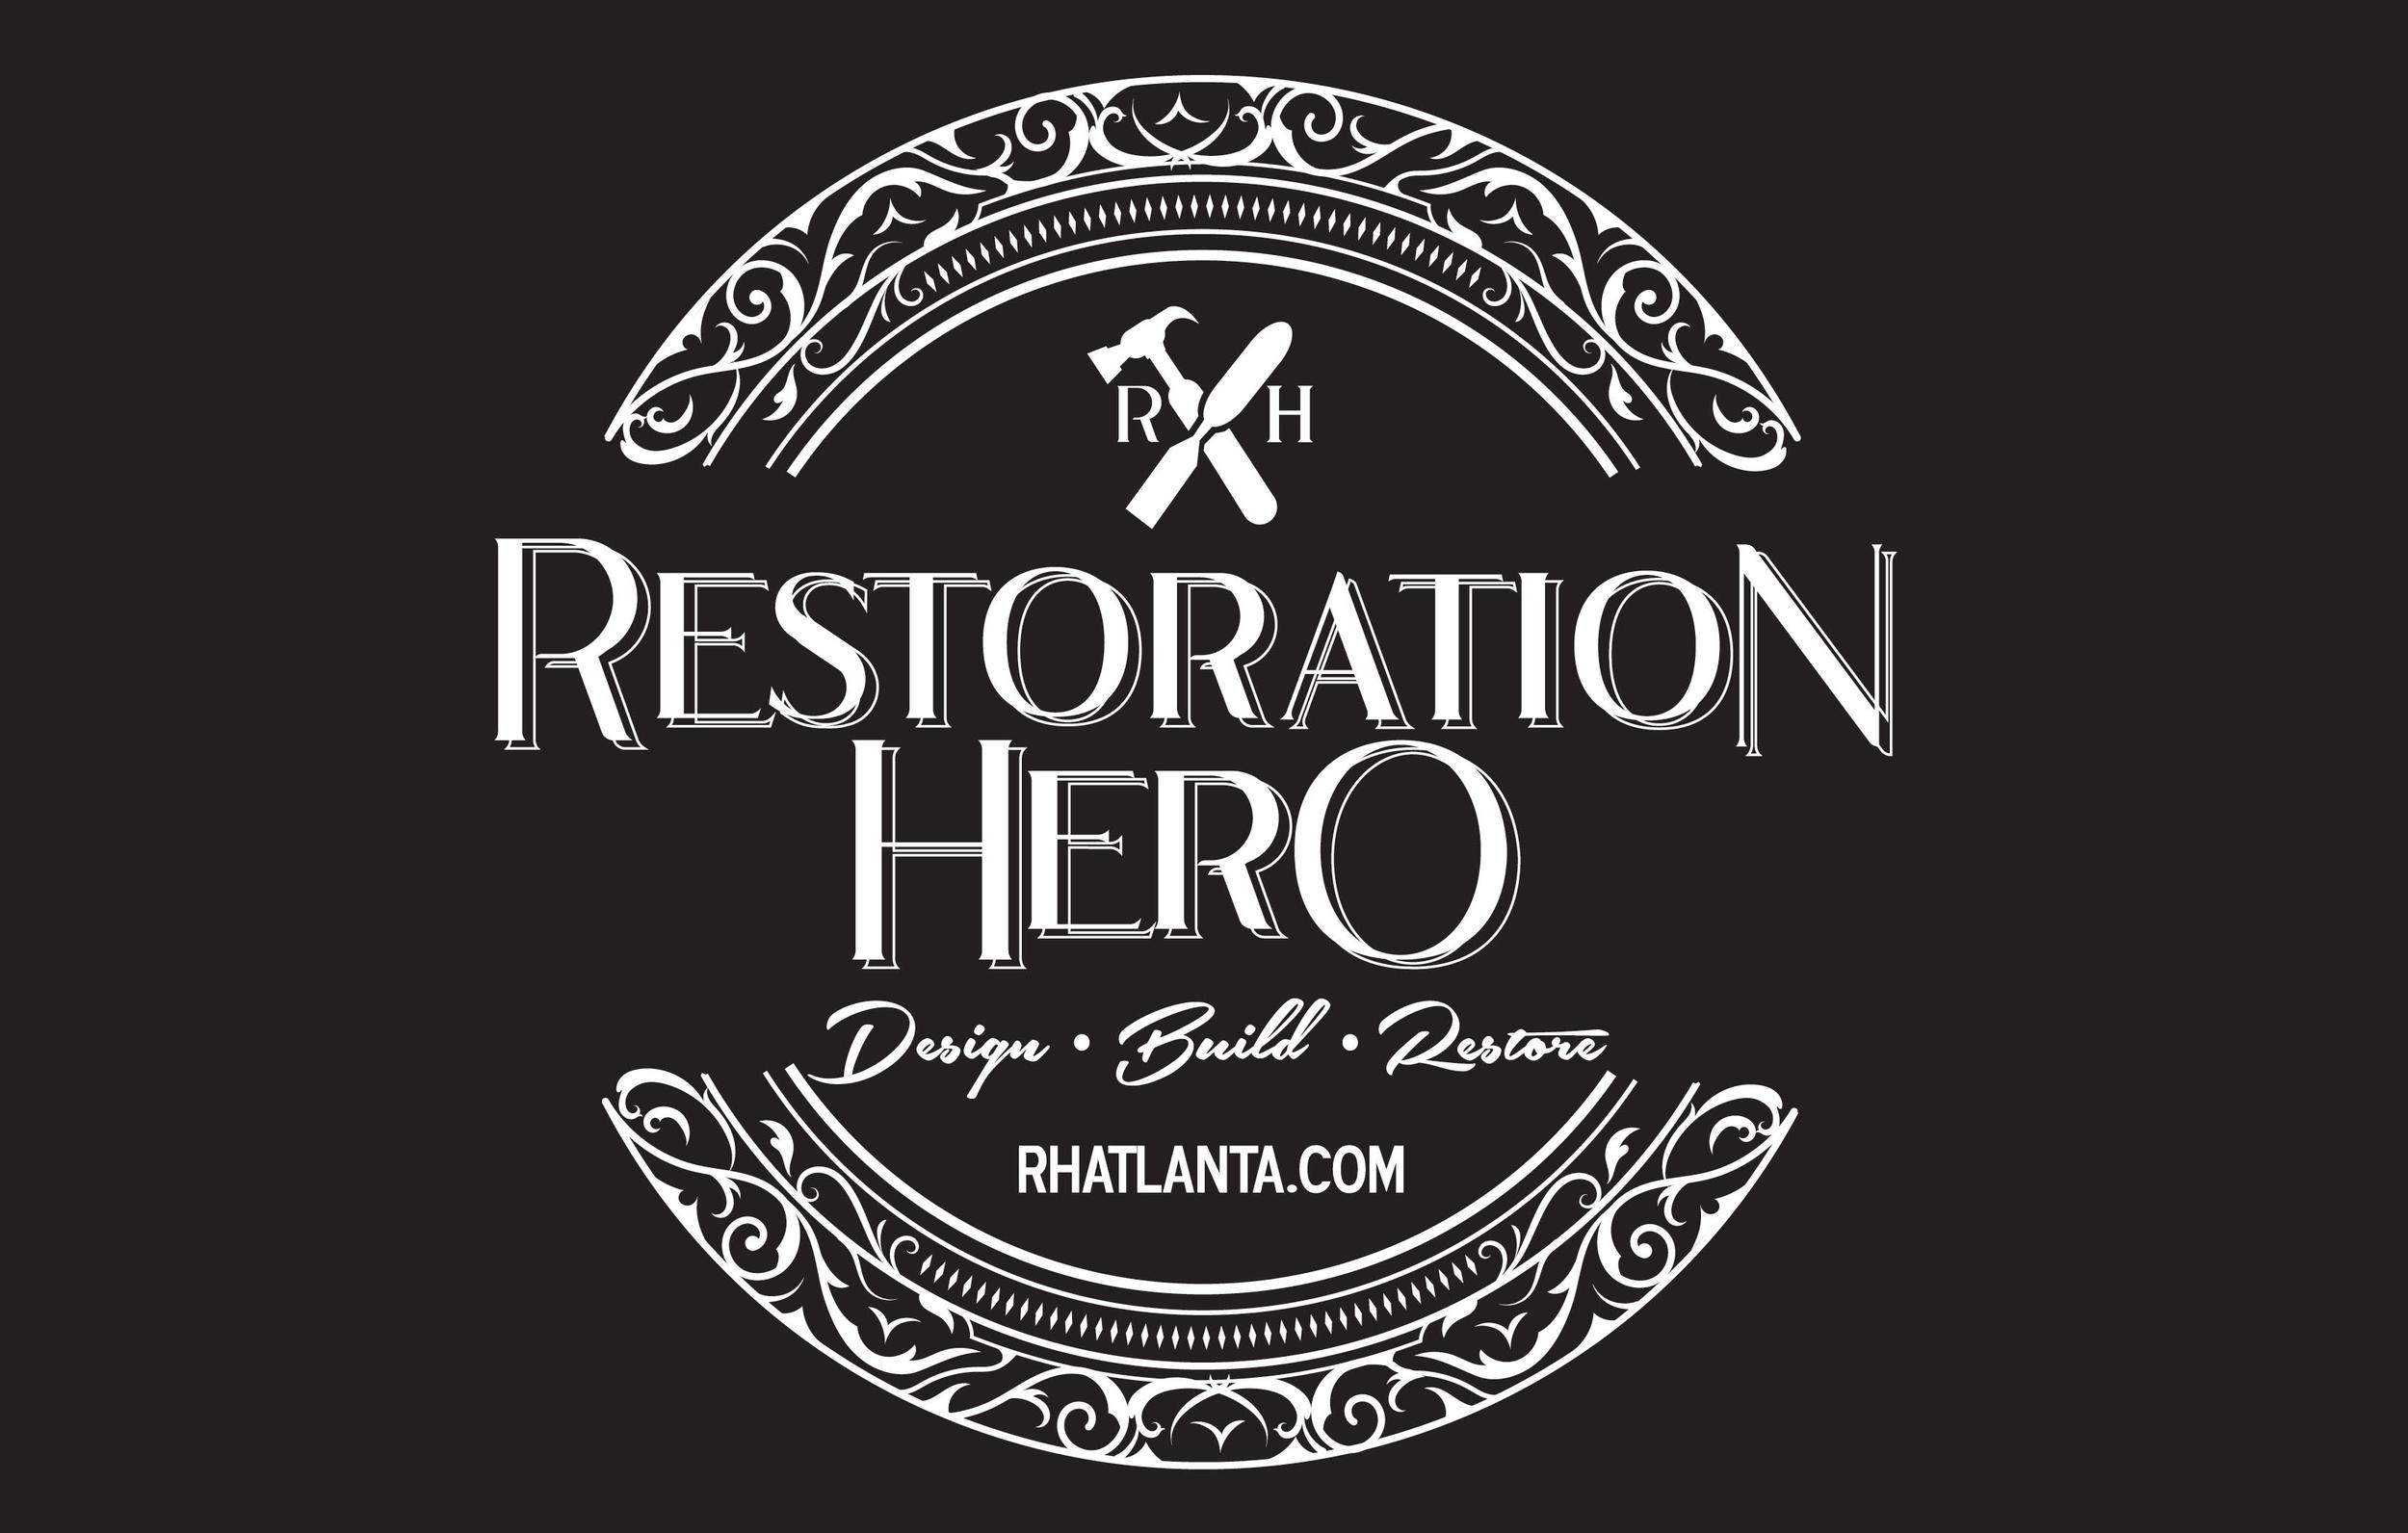 Restoration Hero